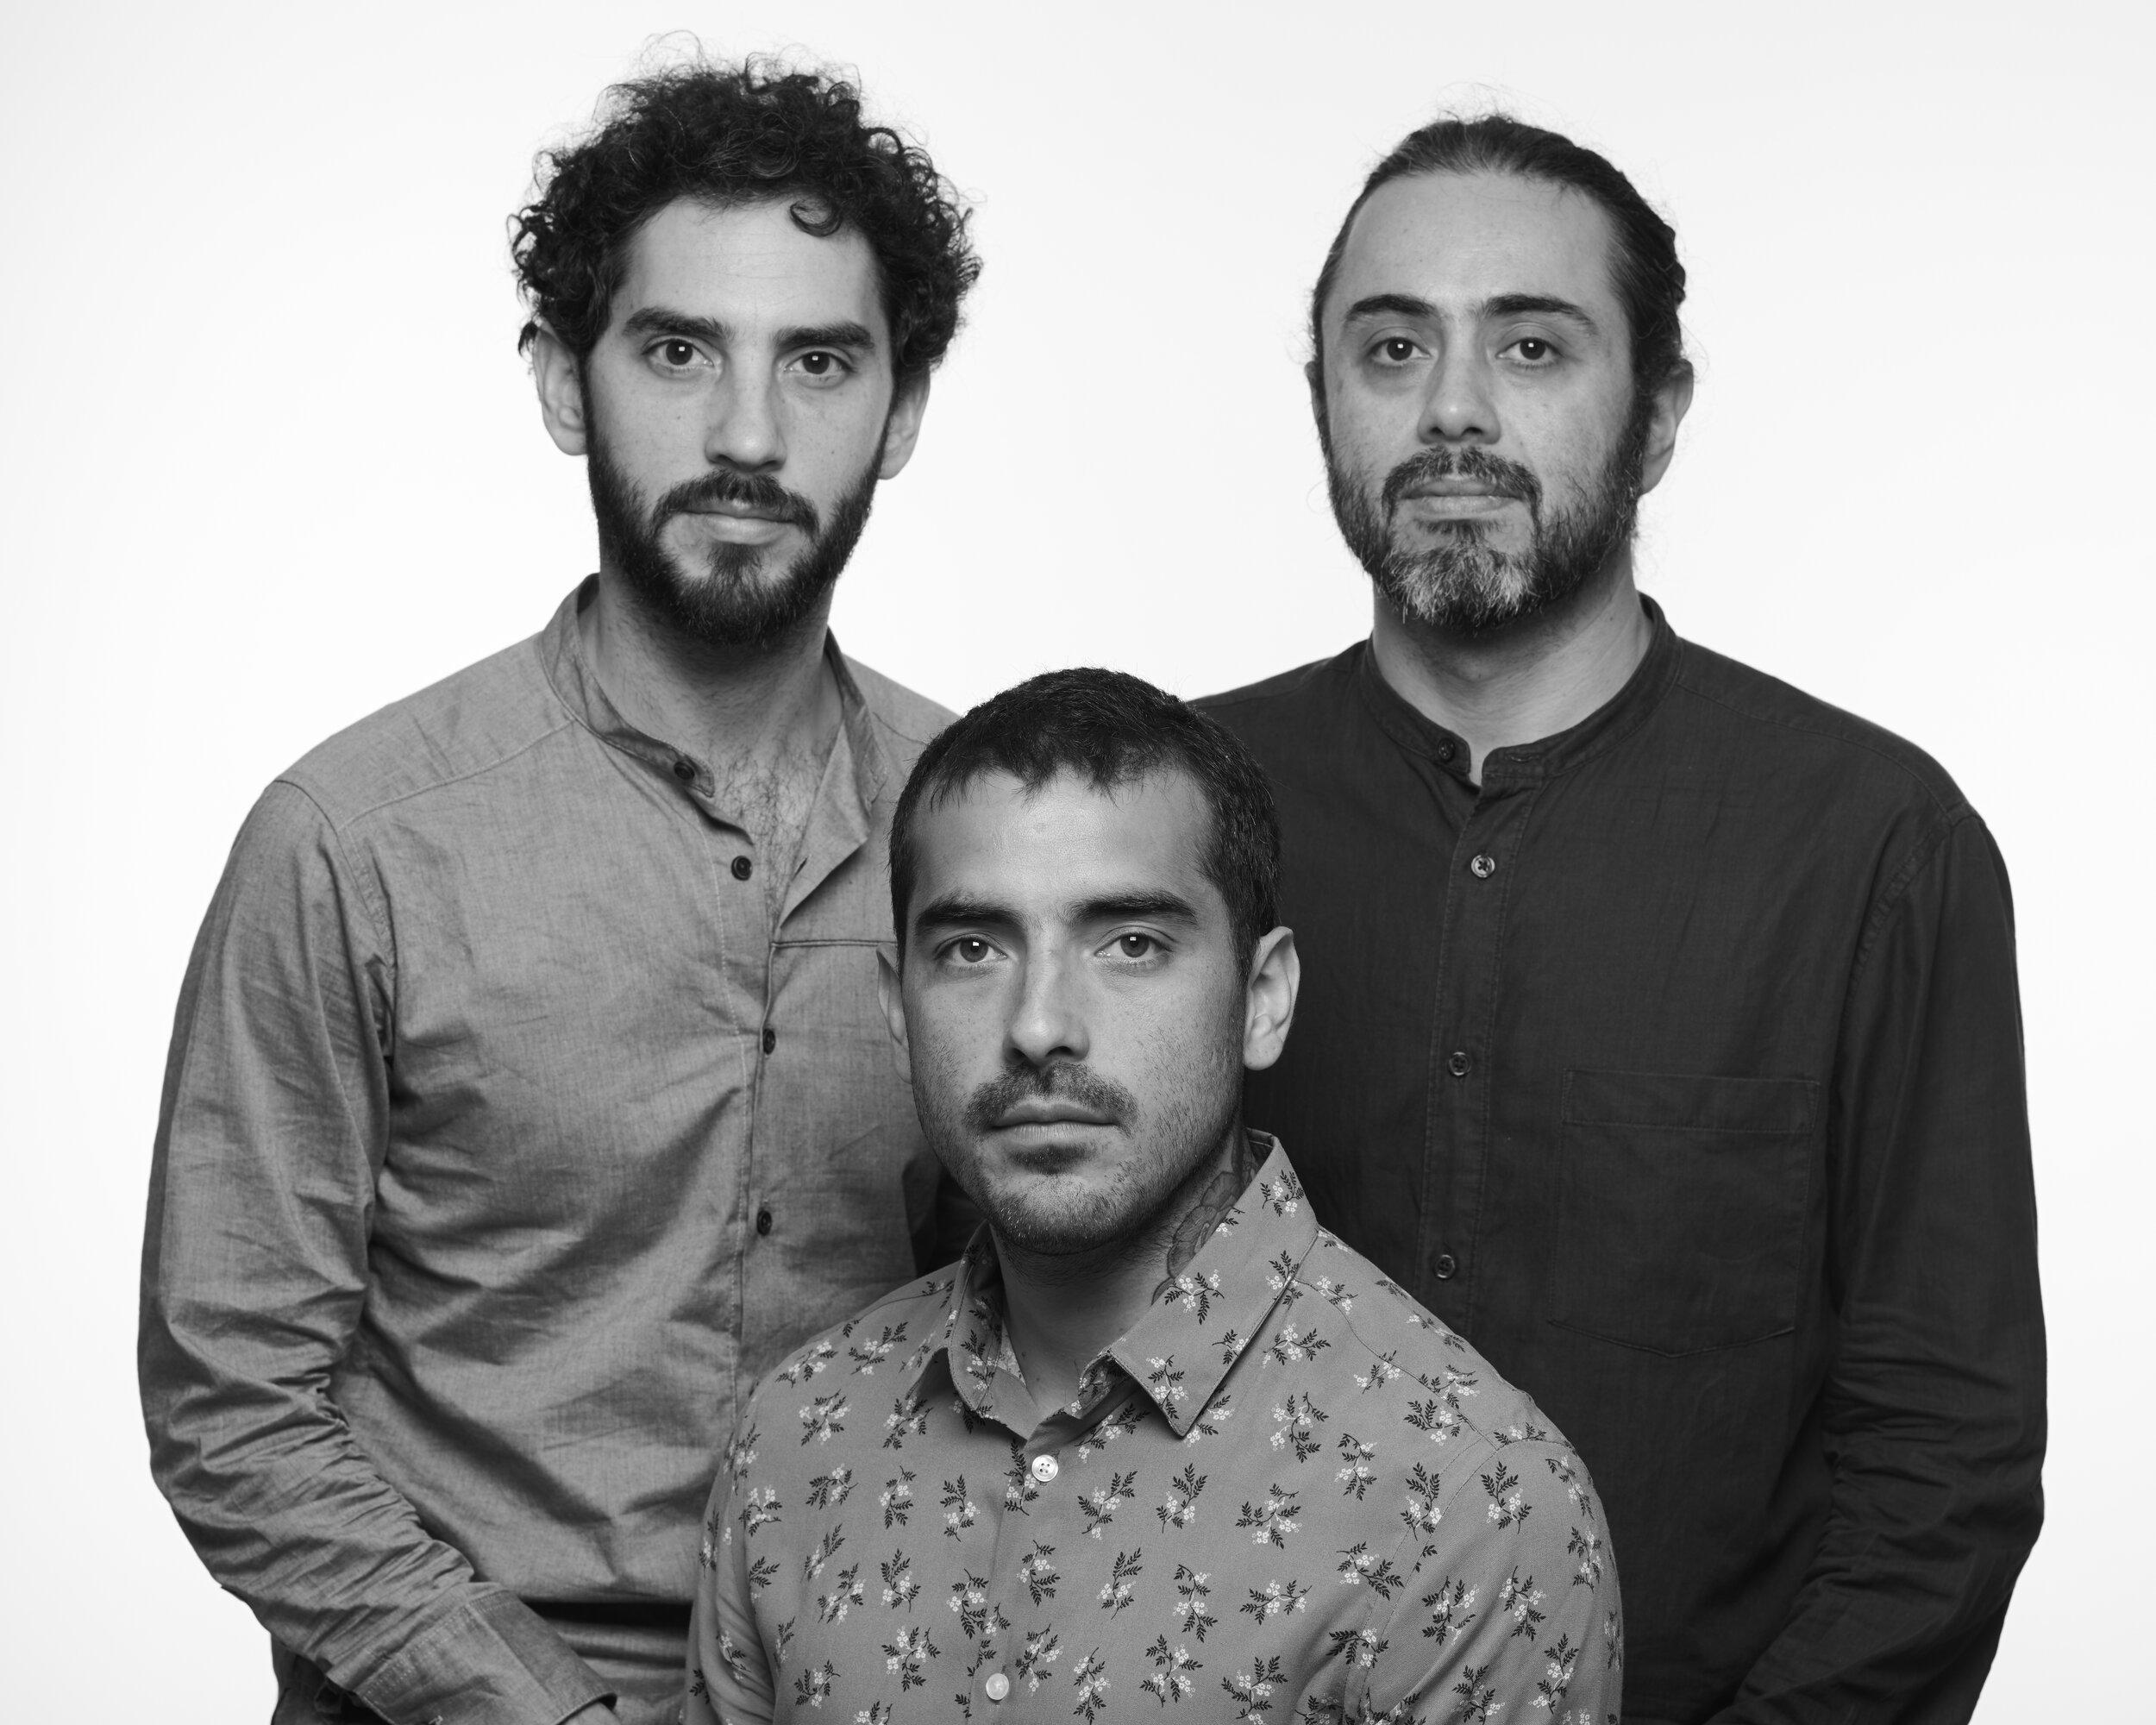 Nómada - Nicolás Vera / Pablo Menares / Félix Lecaros ©Philippe Blanc 2019